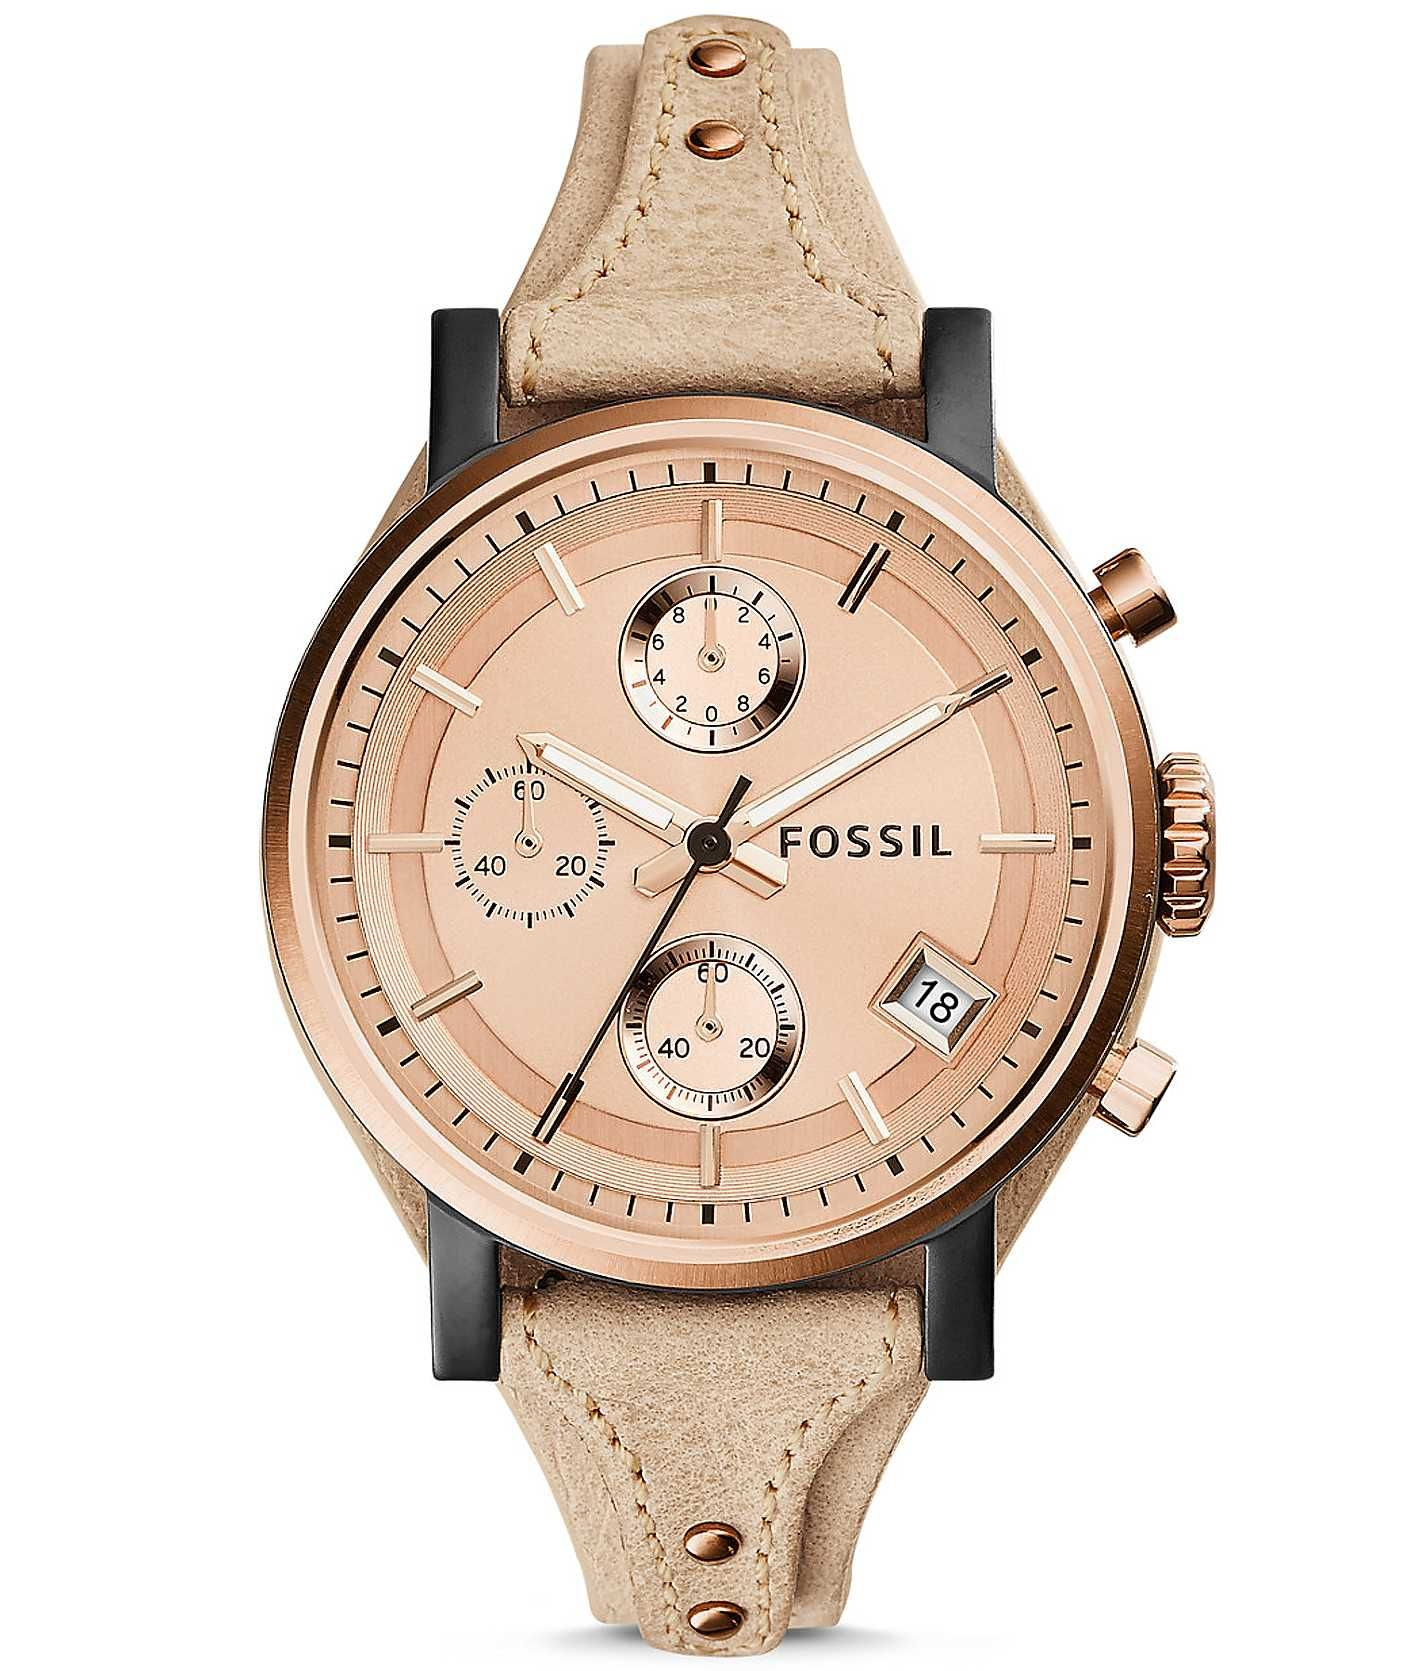 Fossil The Original Boyfriend Watch Fossil Watches Boyfriend Watch Womens Watches